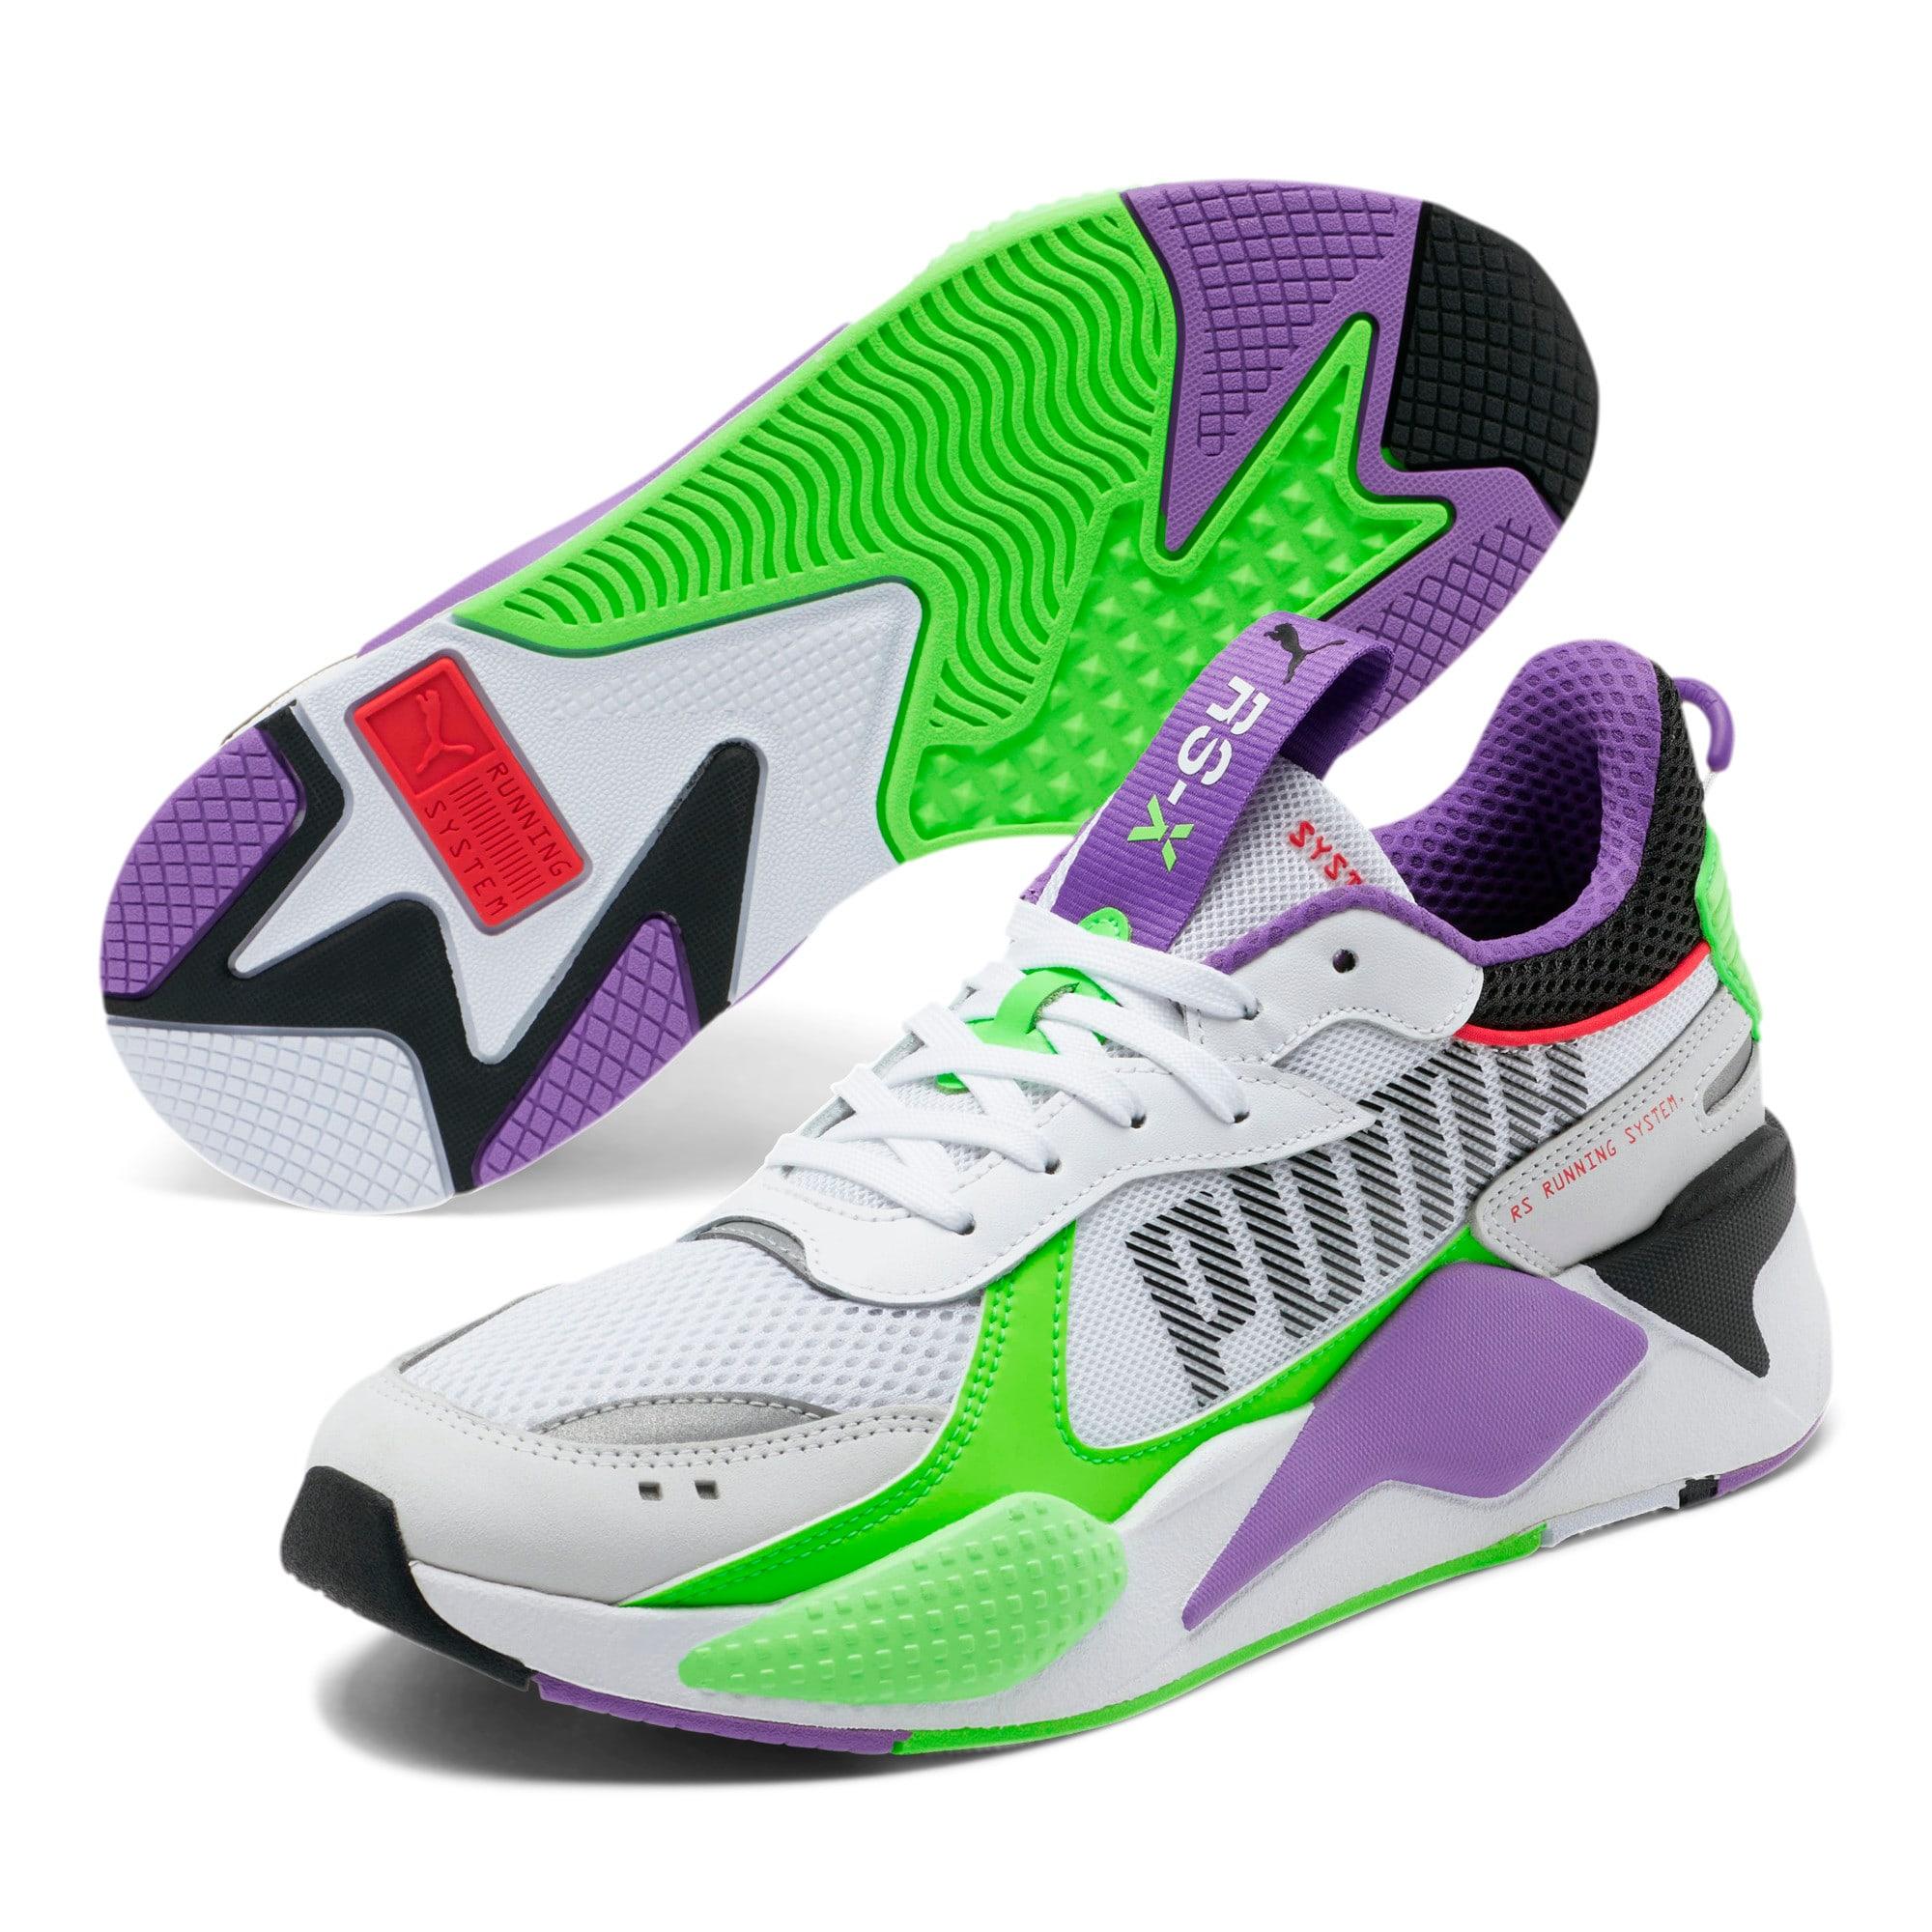 Thumbnail 2 of RS-X Bold Sneakers, PWhite-Gr Gecko-Royal Lilac, medium